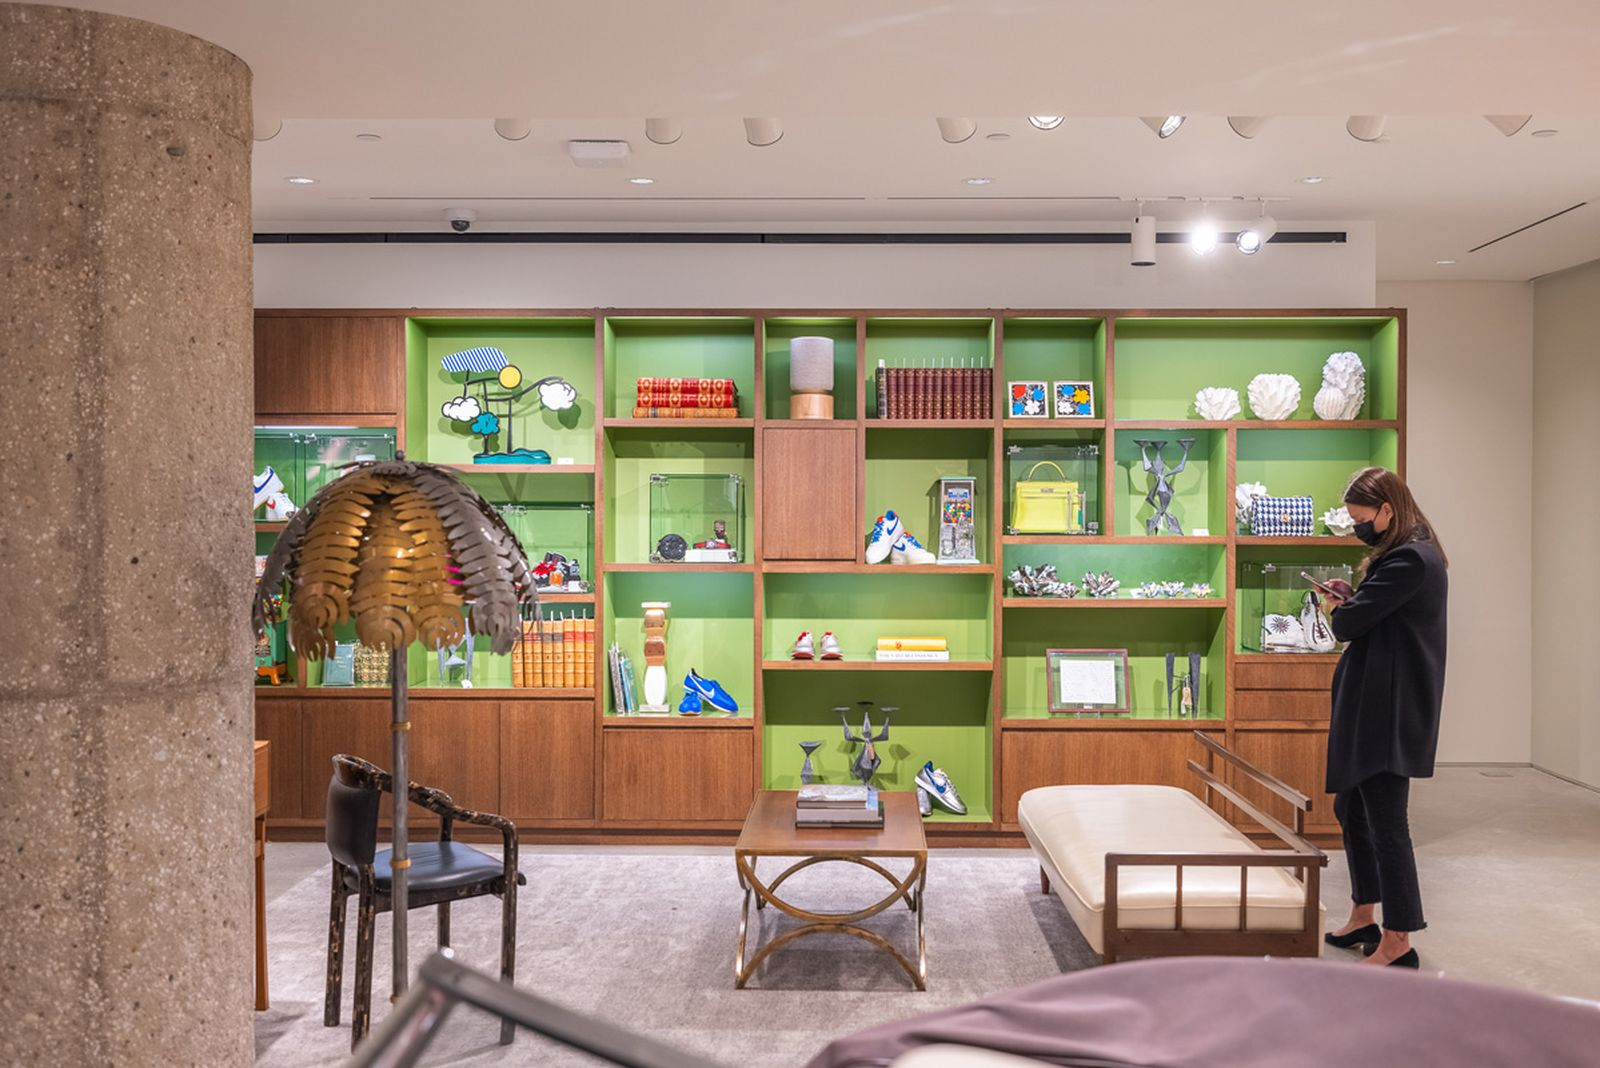 sothebys-permanent-retail-store-new-york-5